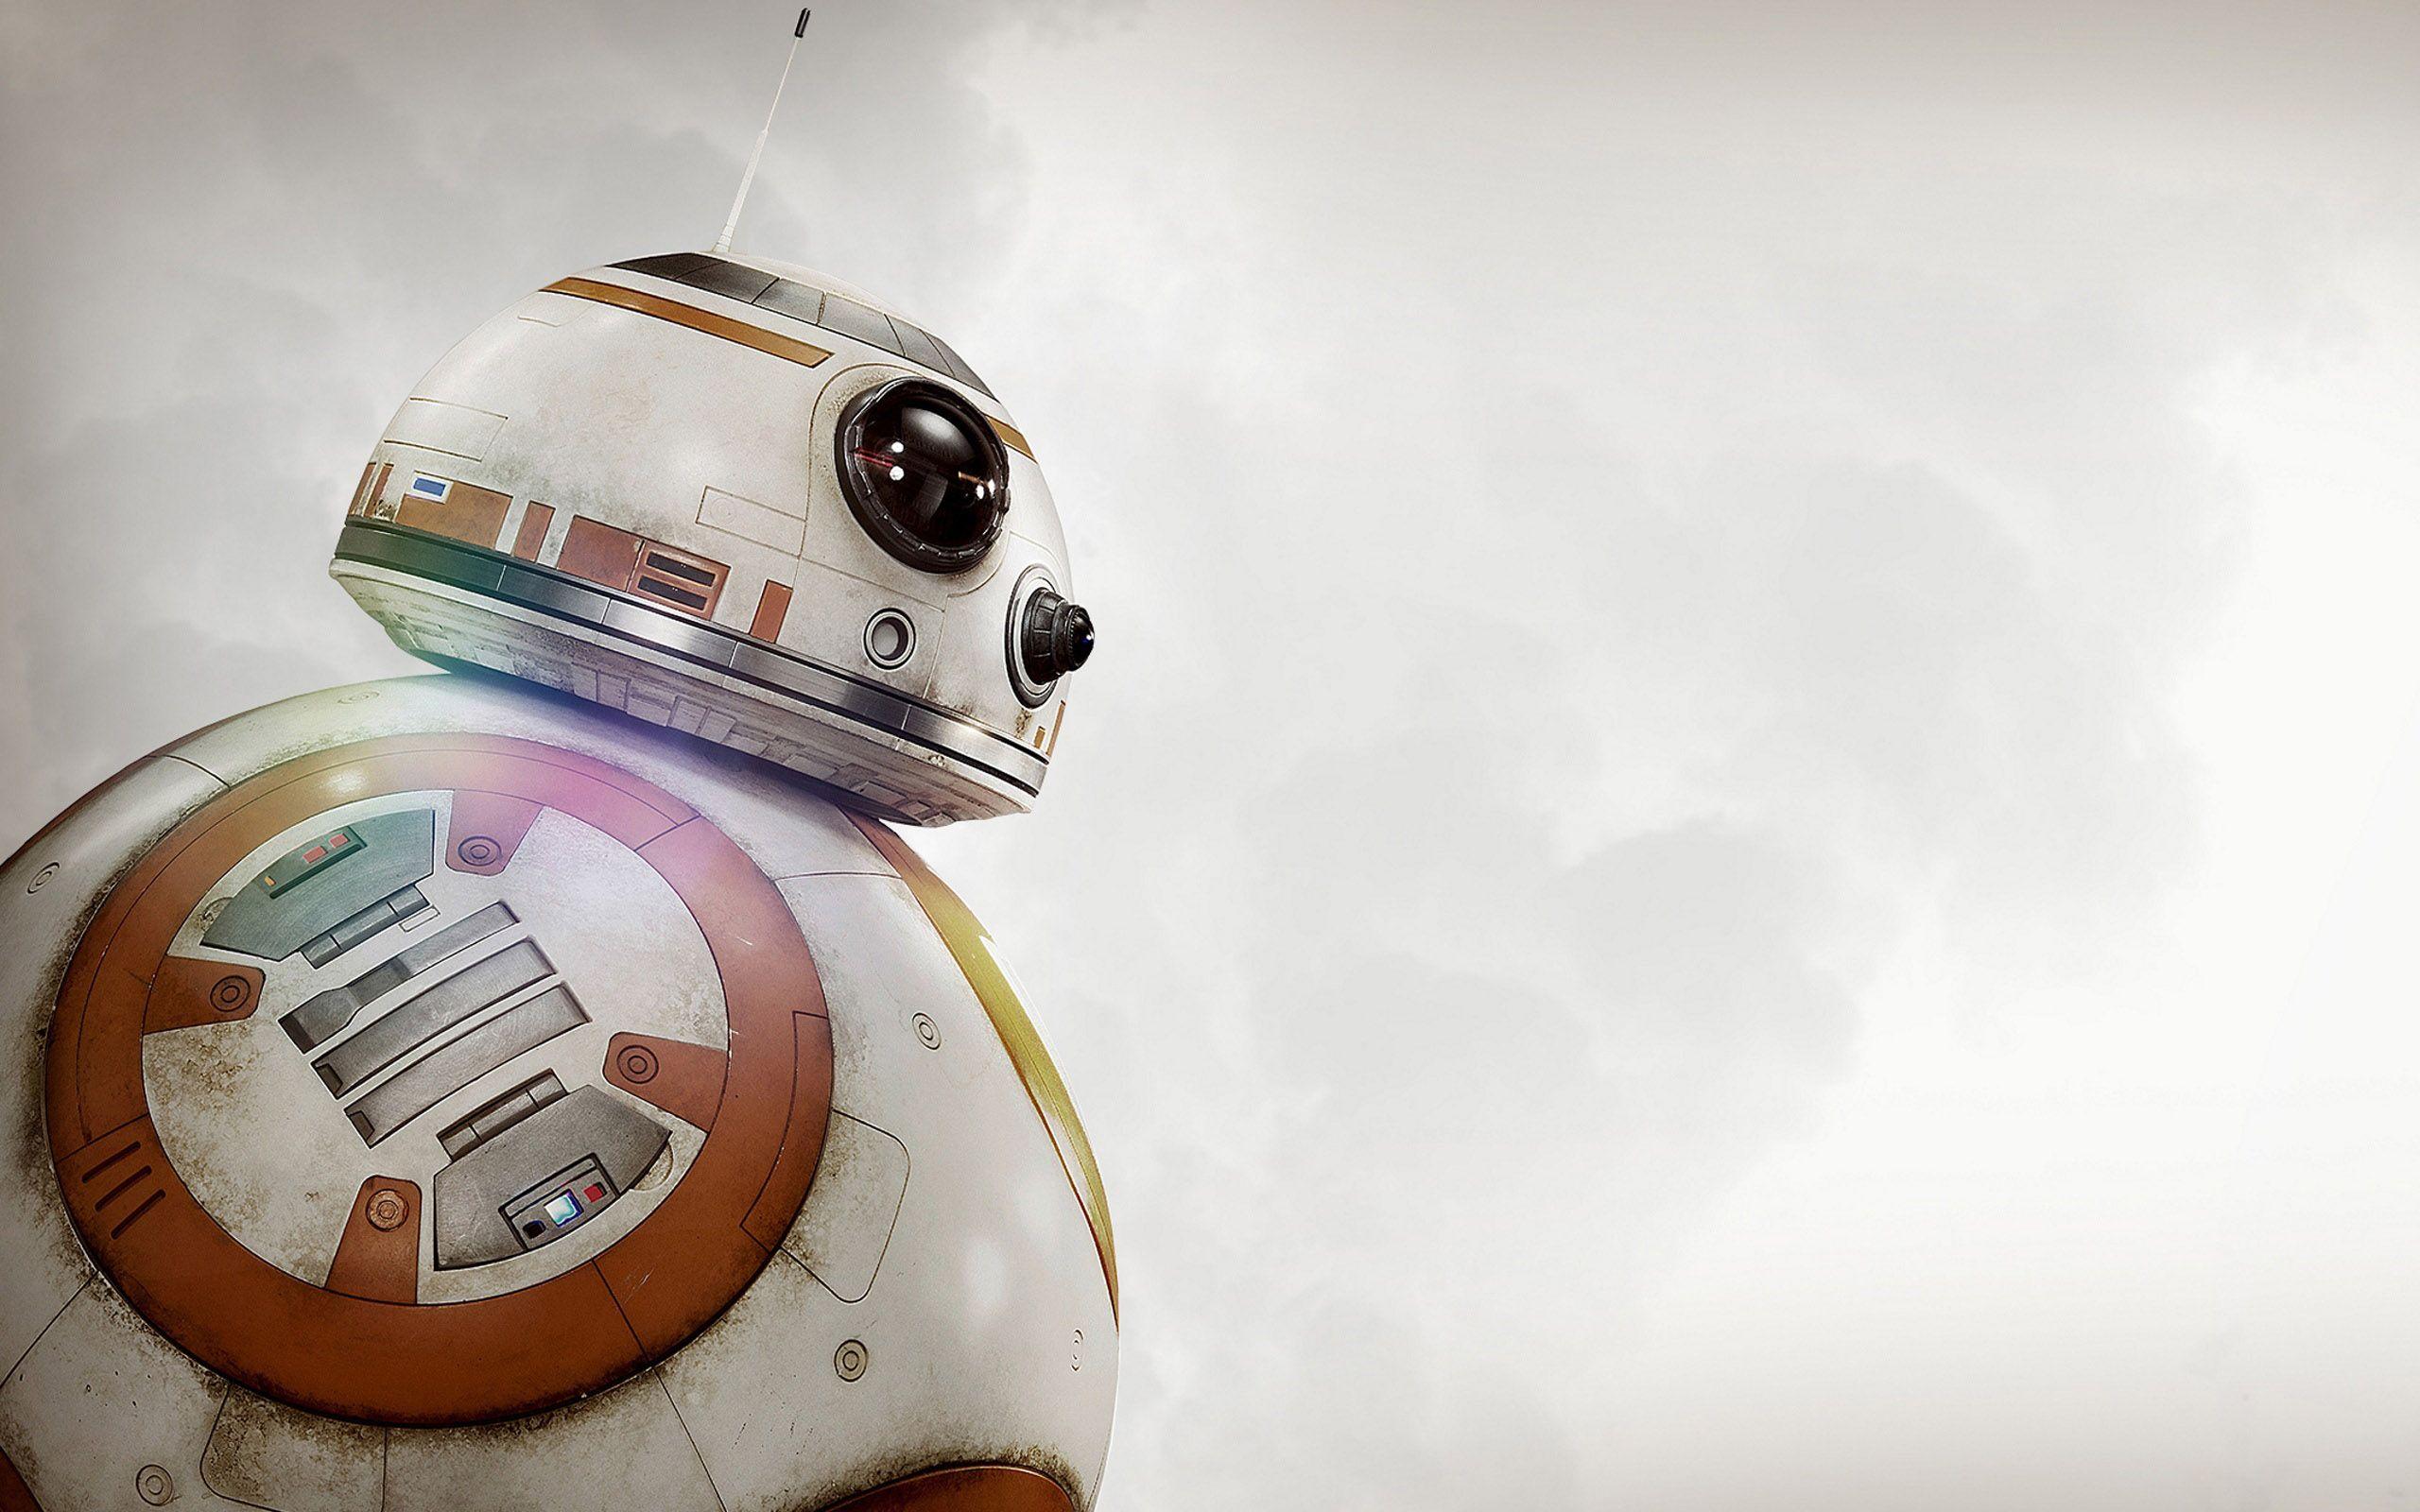 Star Wars The Force Awakens Wallpapers Photo Fondos De